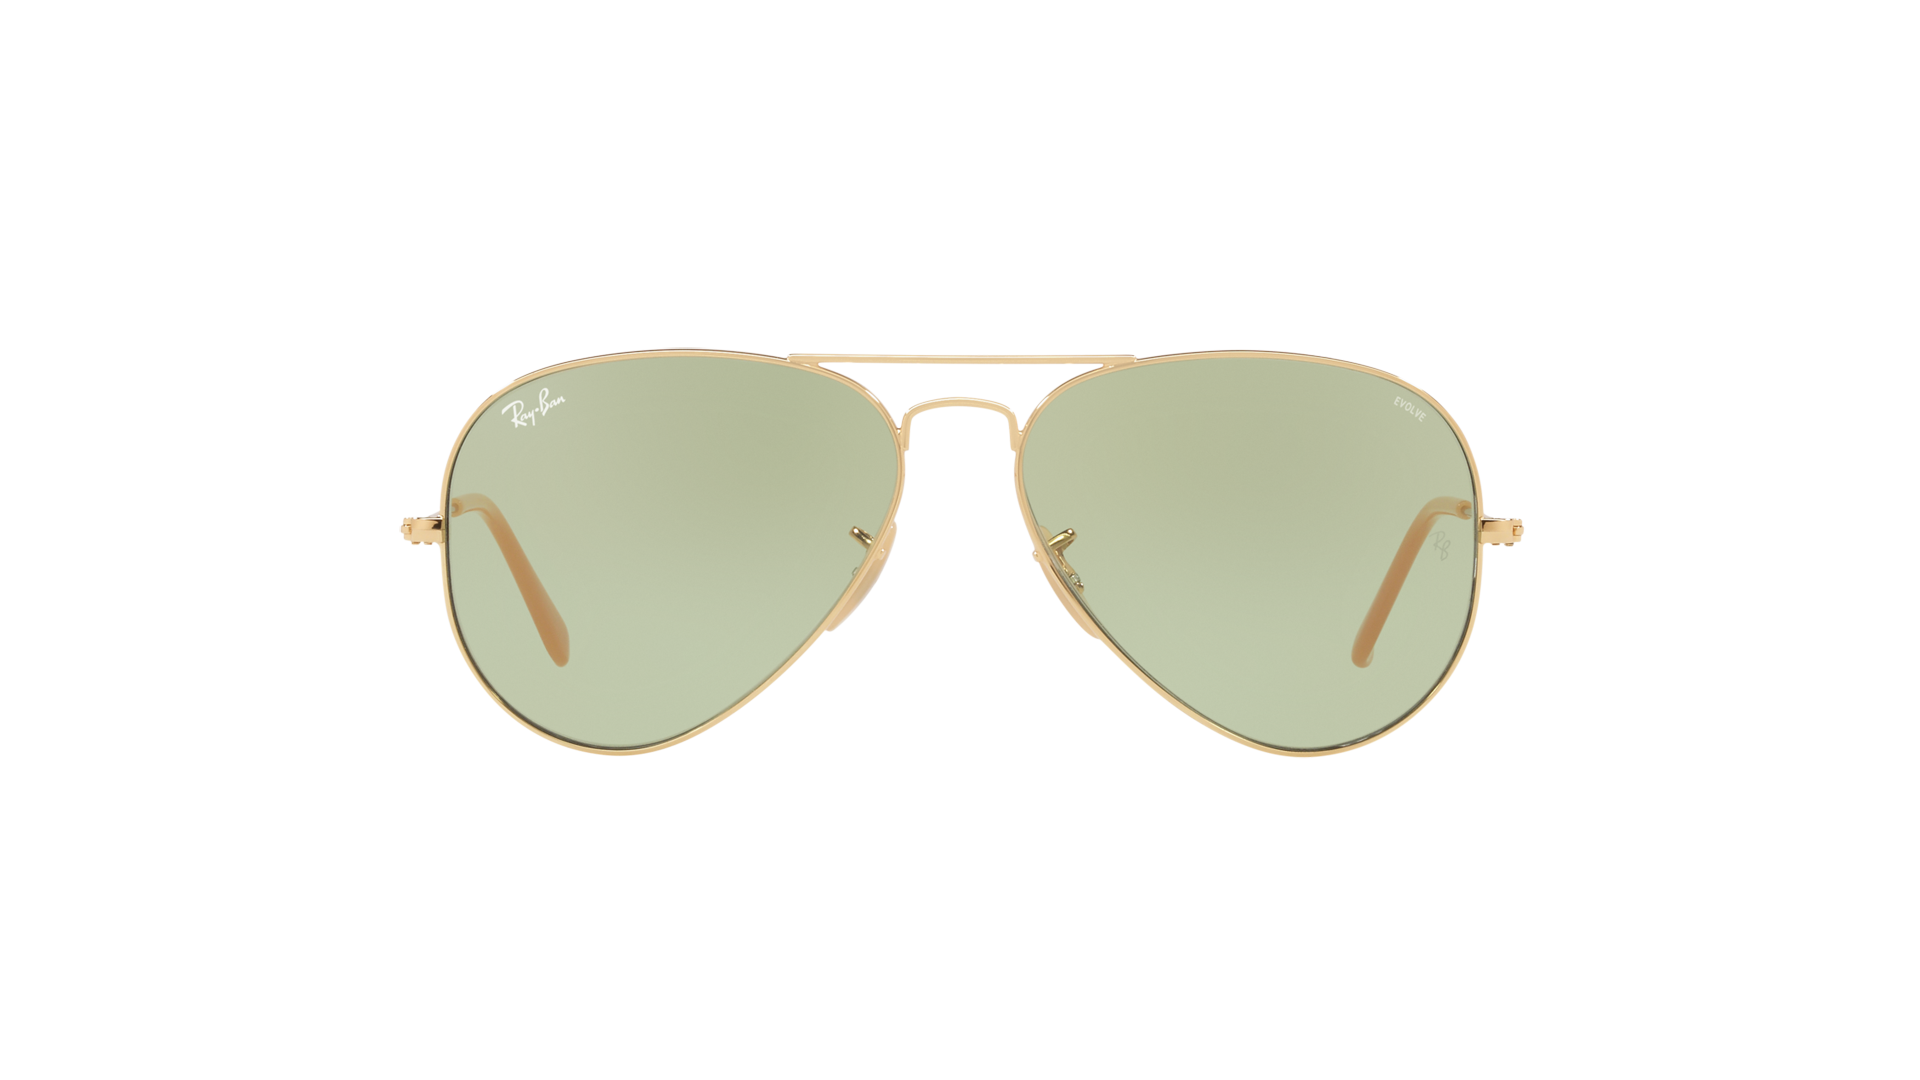 Sunglasses Ray-Ban Aviator Evolve Gold RB3025 9064 4C 58-14 Large  Photochromic db2c70363922